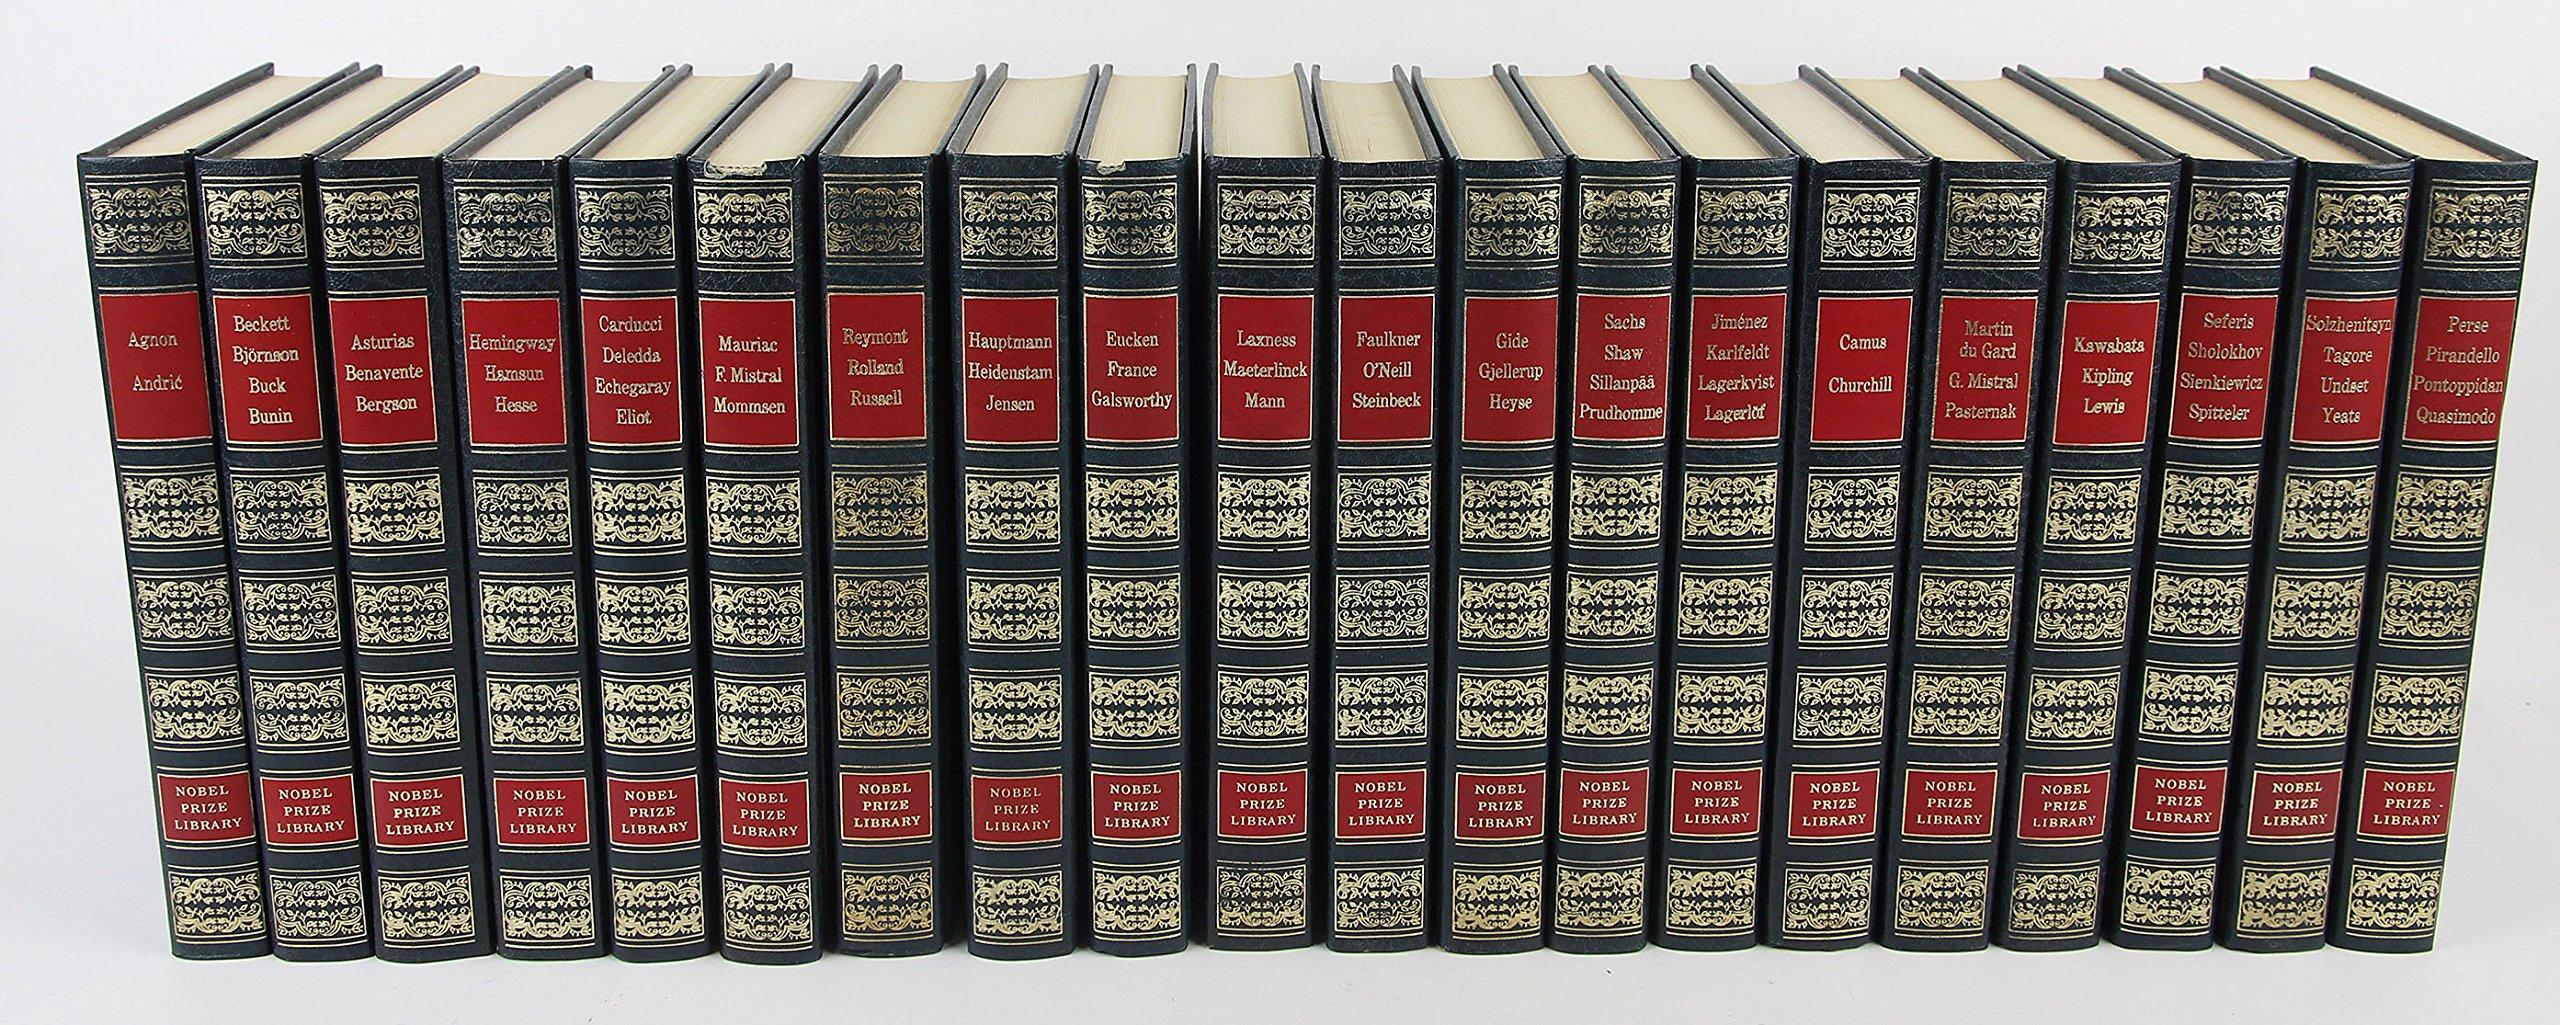 Amazon.com: Nobel Prize Library 20 Volume Set: Alexis ...